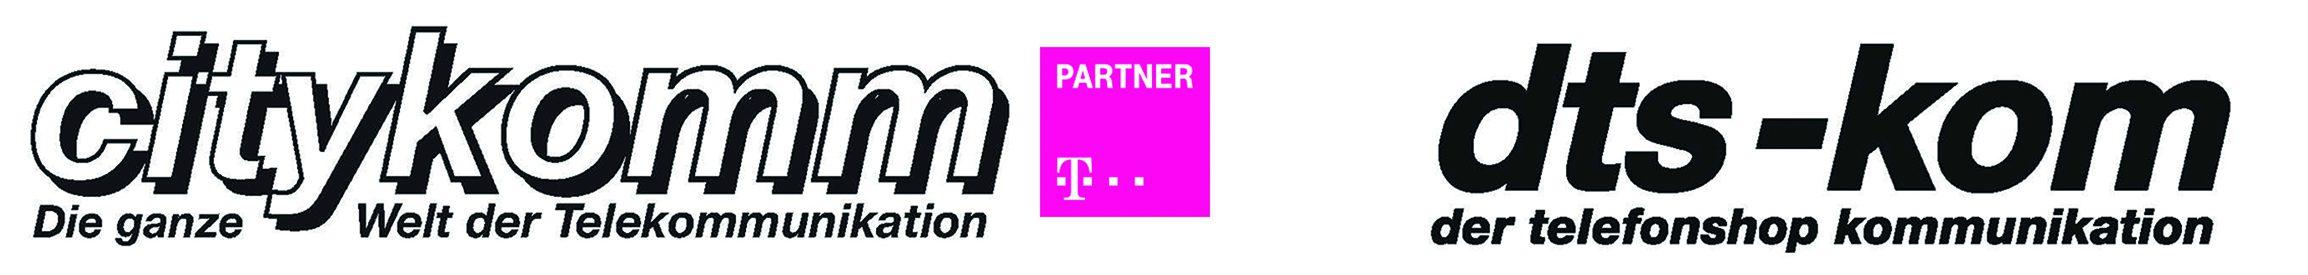 cropped-Logo_onlineShop-2-1.jpg